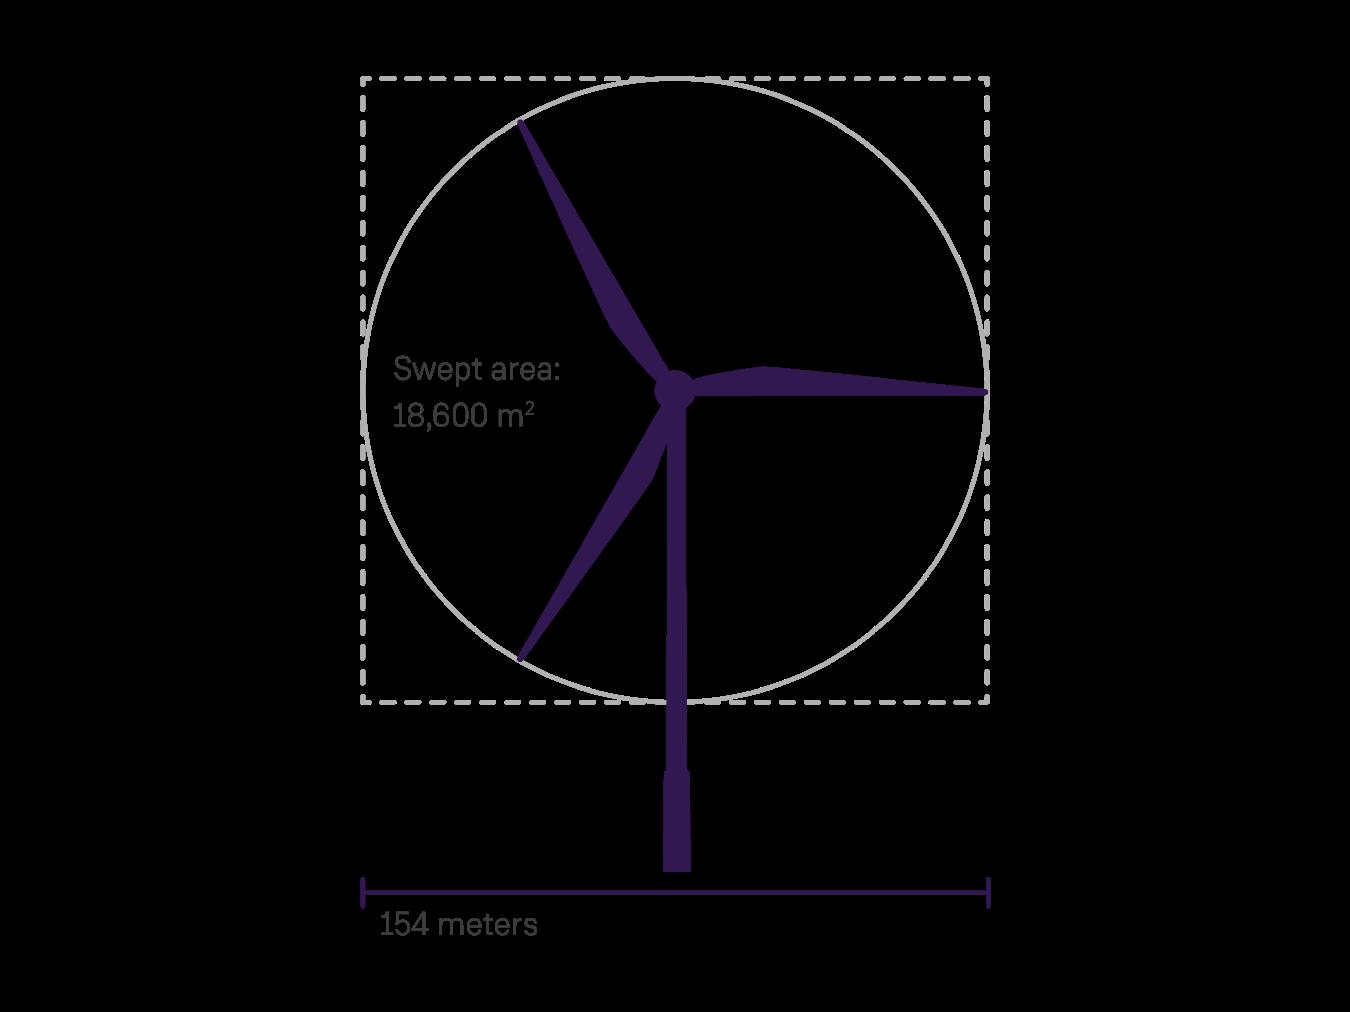 Parques Eólicos: Datos que necesitas saber